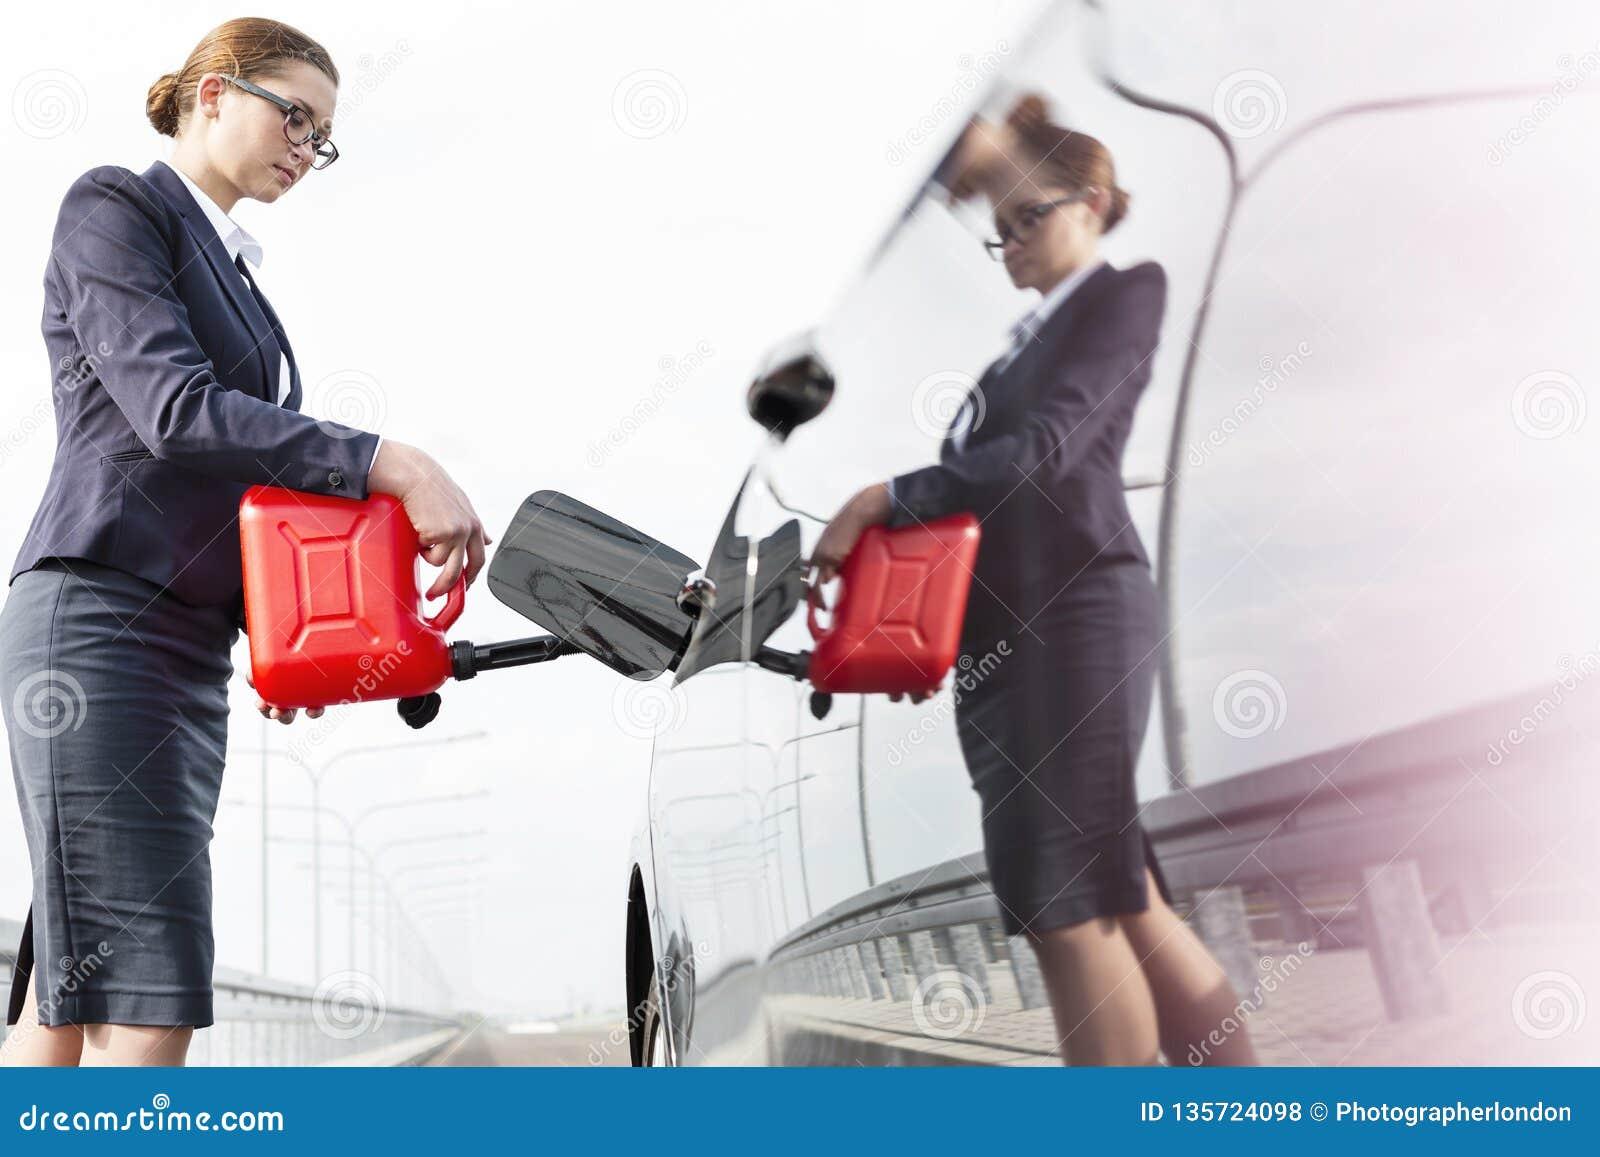 Lage hoekmening van stafmedewerker met bus die auto van brandstof voorzien tegen hemel